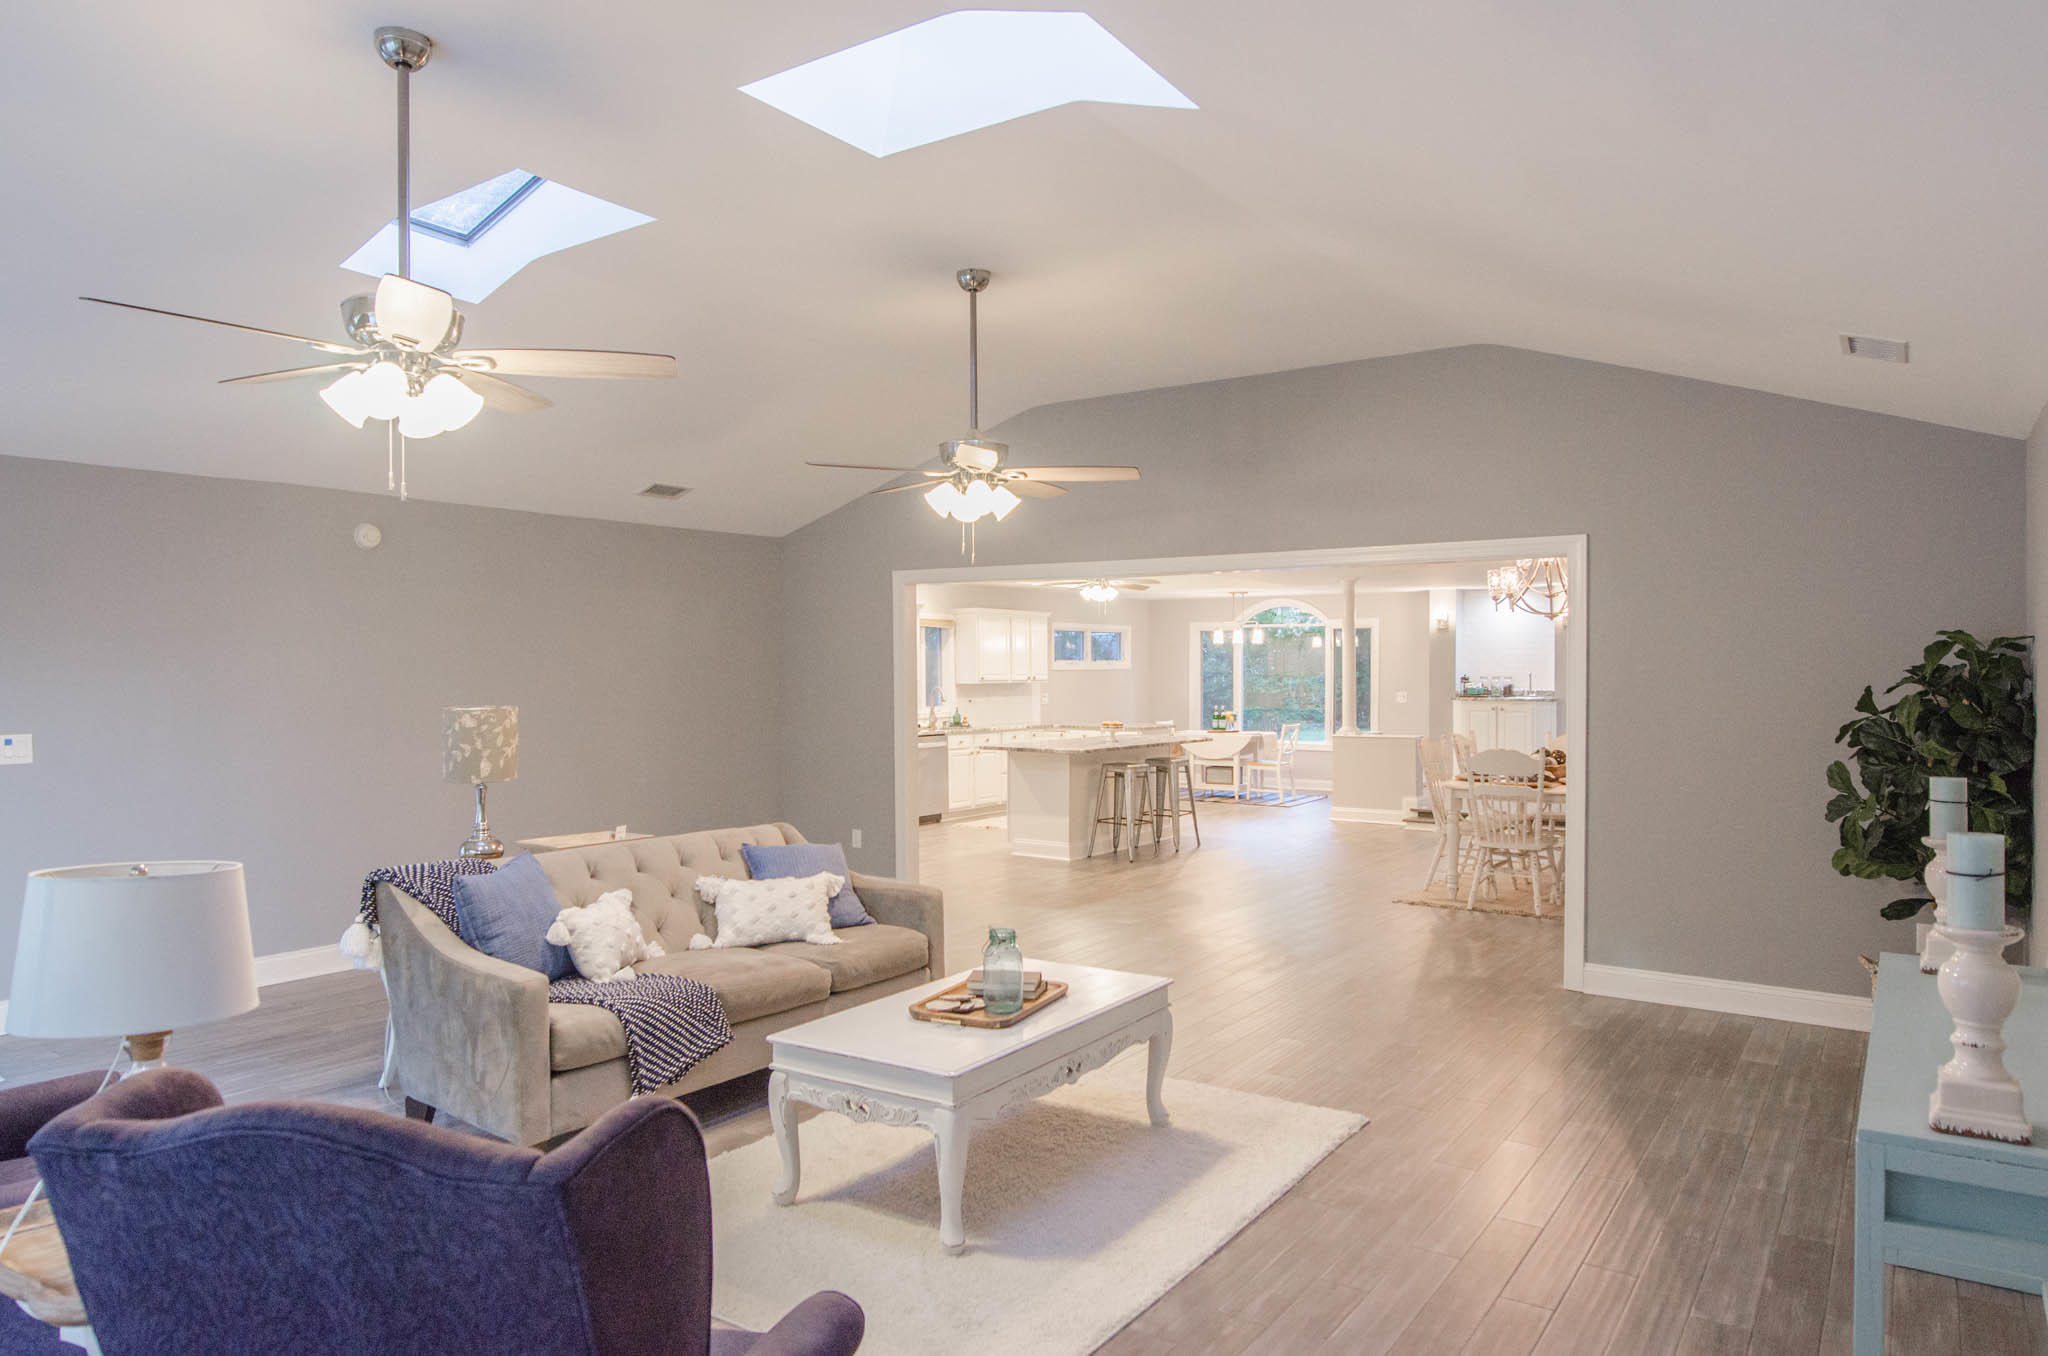 Covington Hills Homes For Sale - 5886 Ryans Bluff, North Charleston, SC - 4